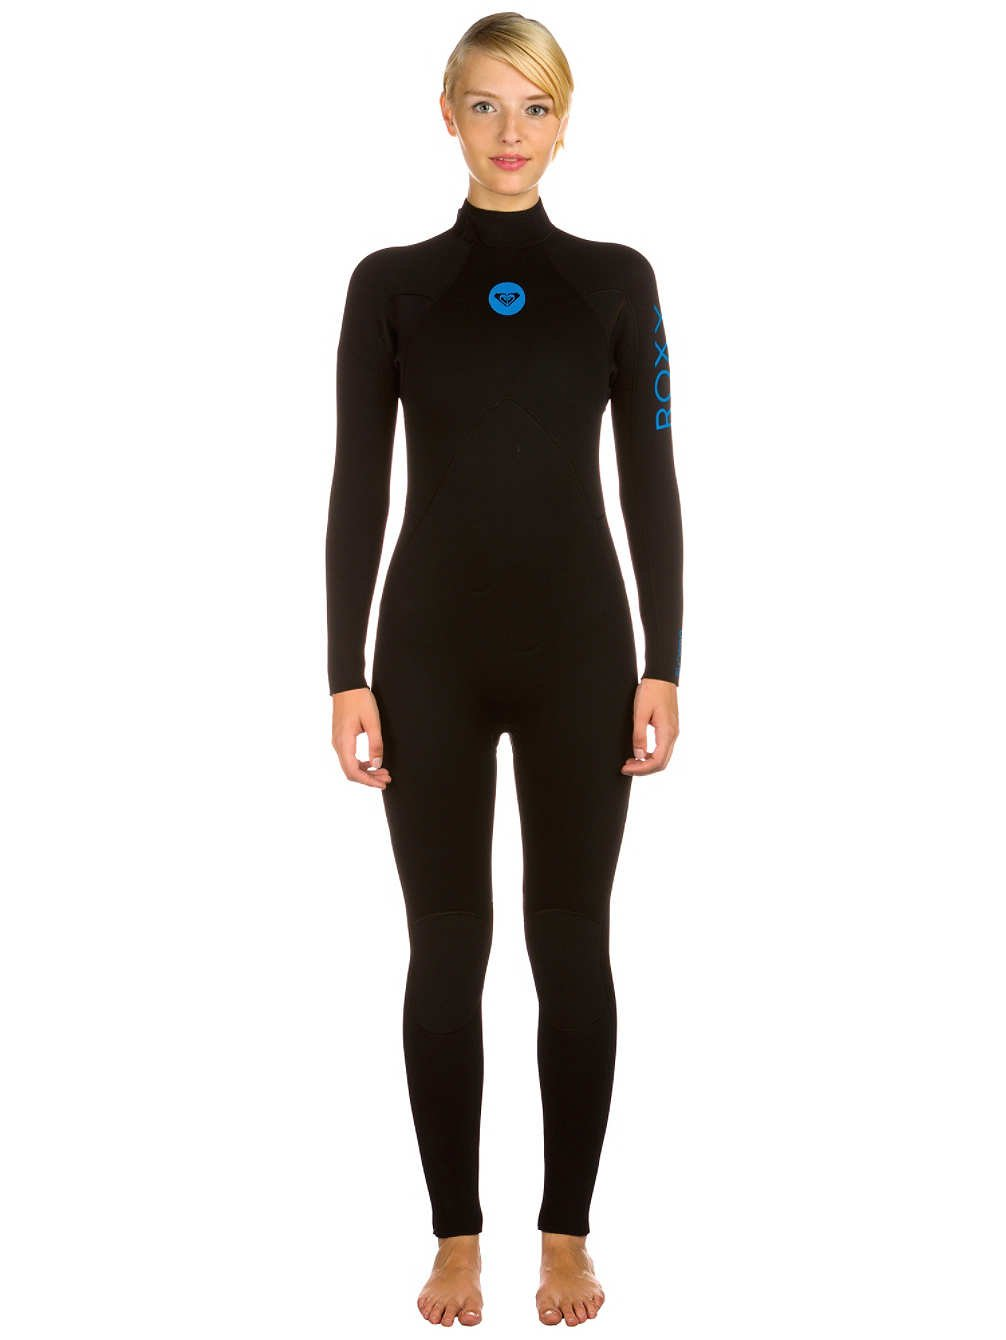 Roxy Womens Syncro Base 32 Flatlock Back Zip Wetsuit 6 ブラック B013RARLVK